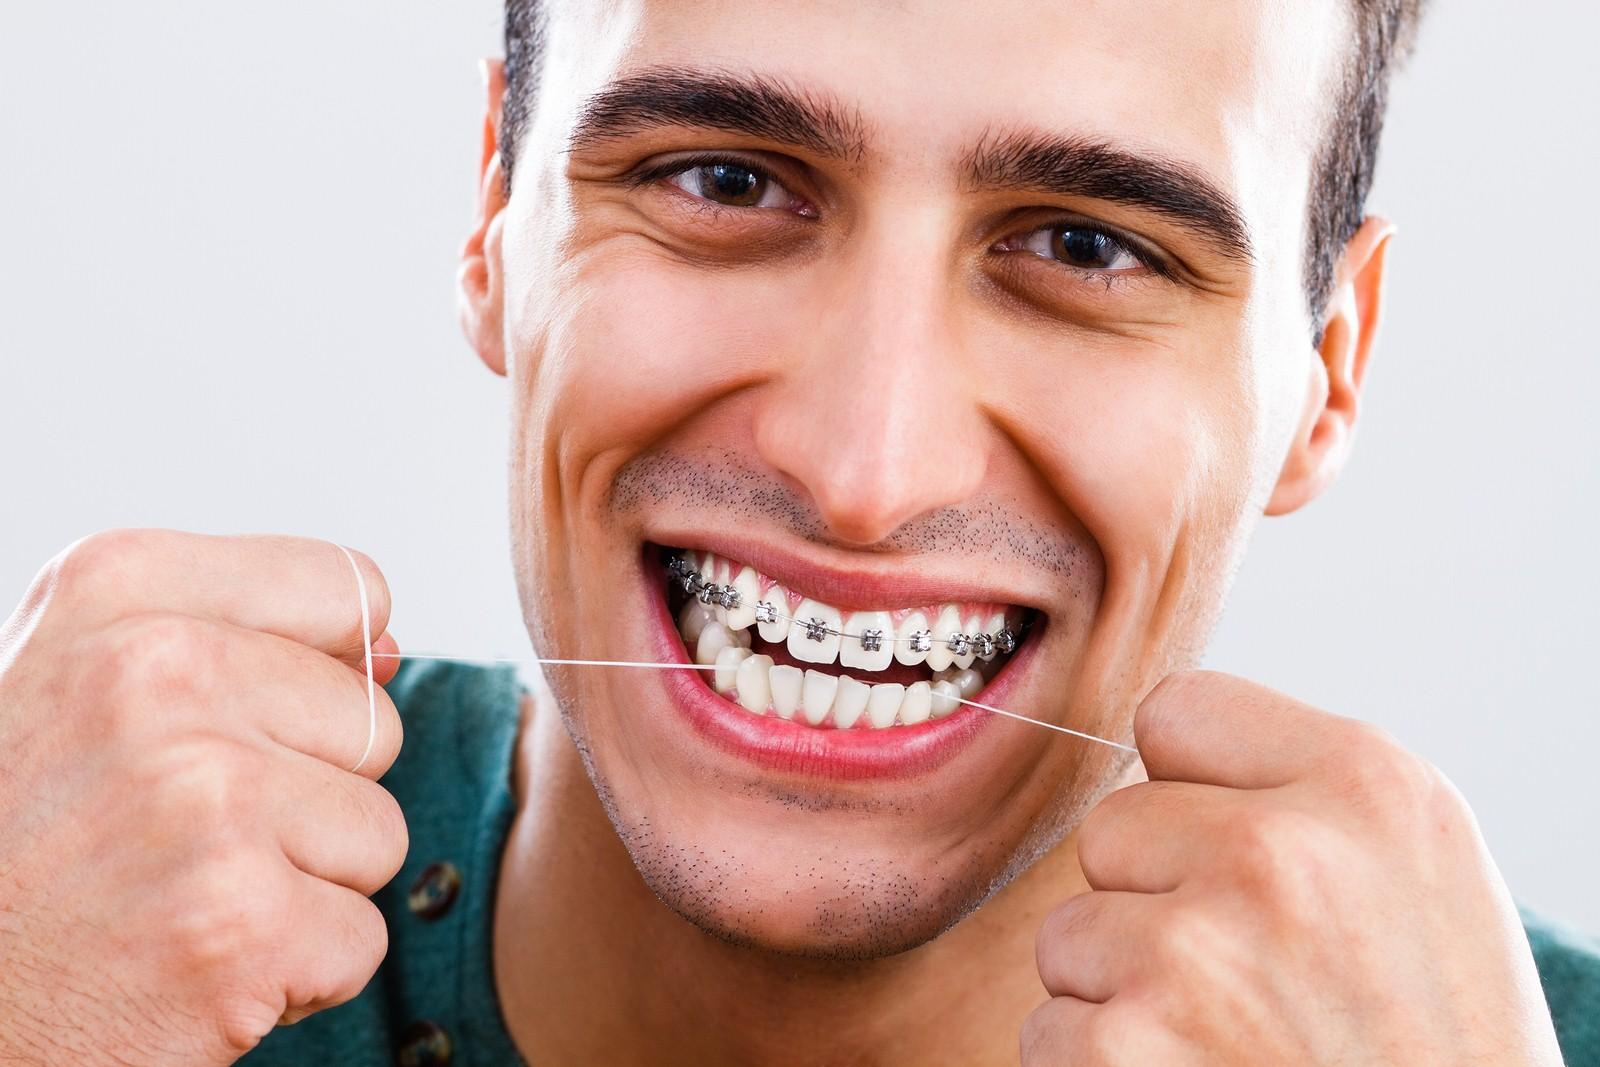 Зубы взрослого человека картинки